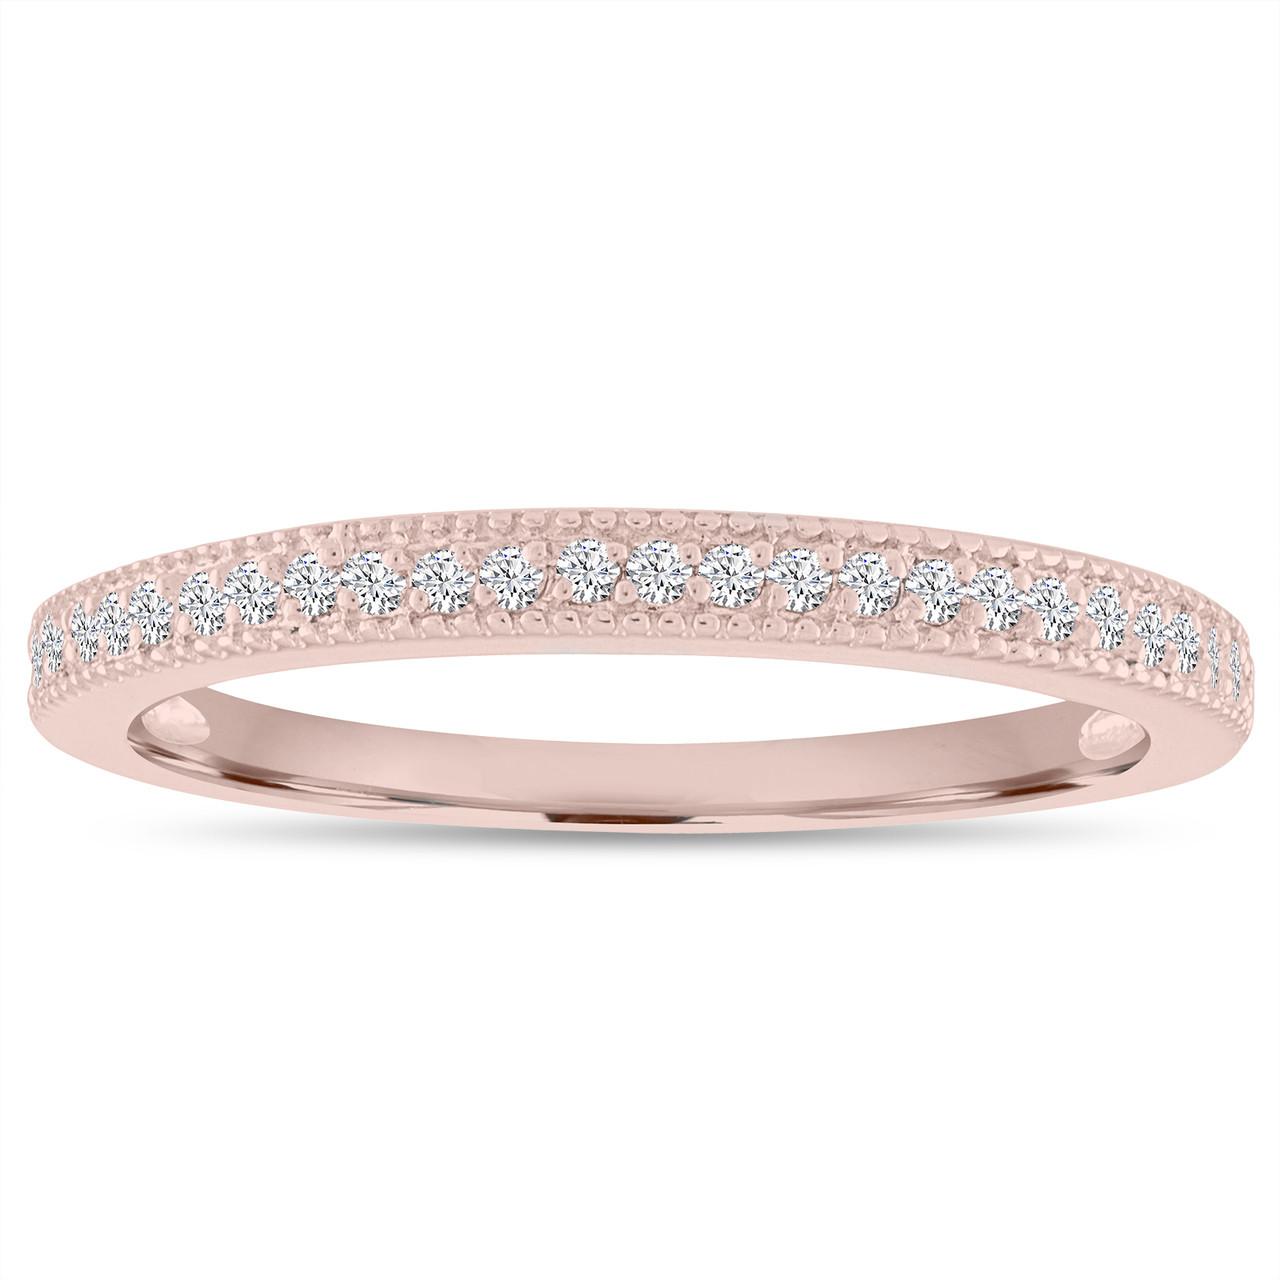 14K Rose Gold Diamond Wedding Band Wedding Ring Half Eternity Anniversary Ring Micro Pave